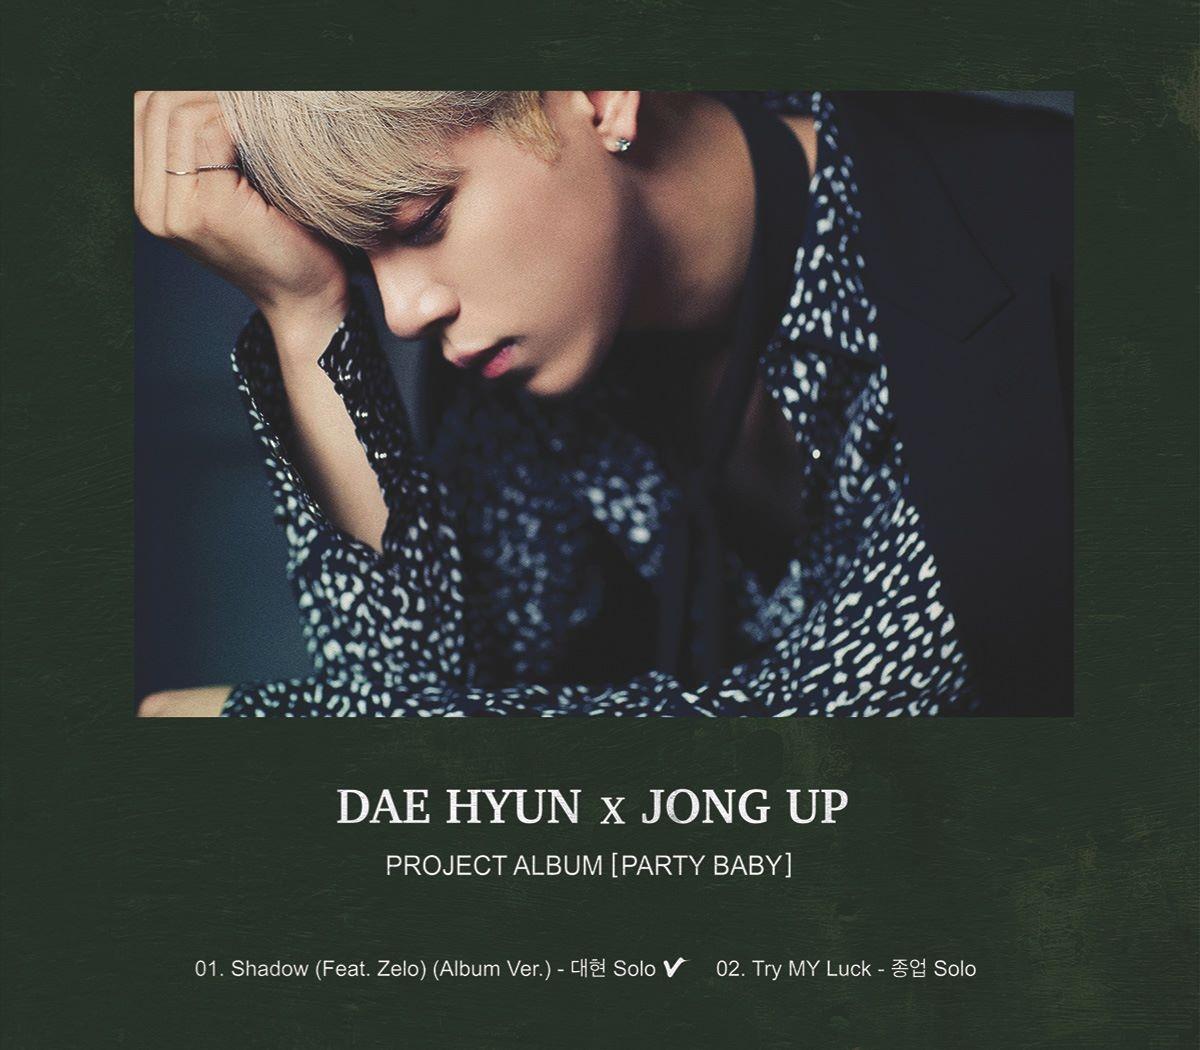 projectalbum_DAEHYUN